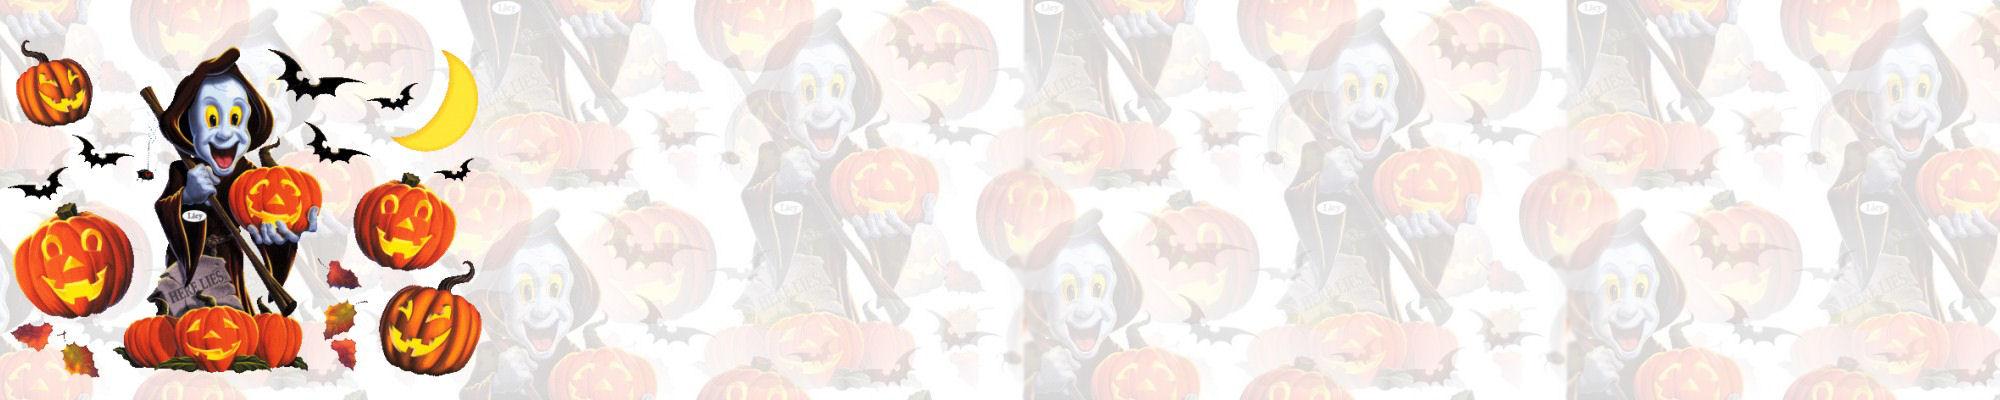 Fondo IM halloween14.imf